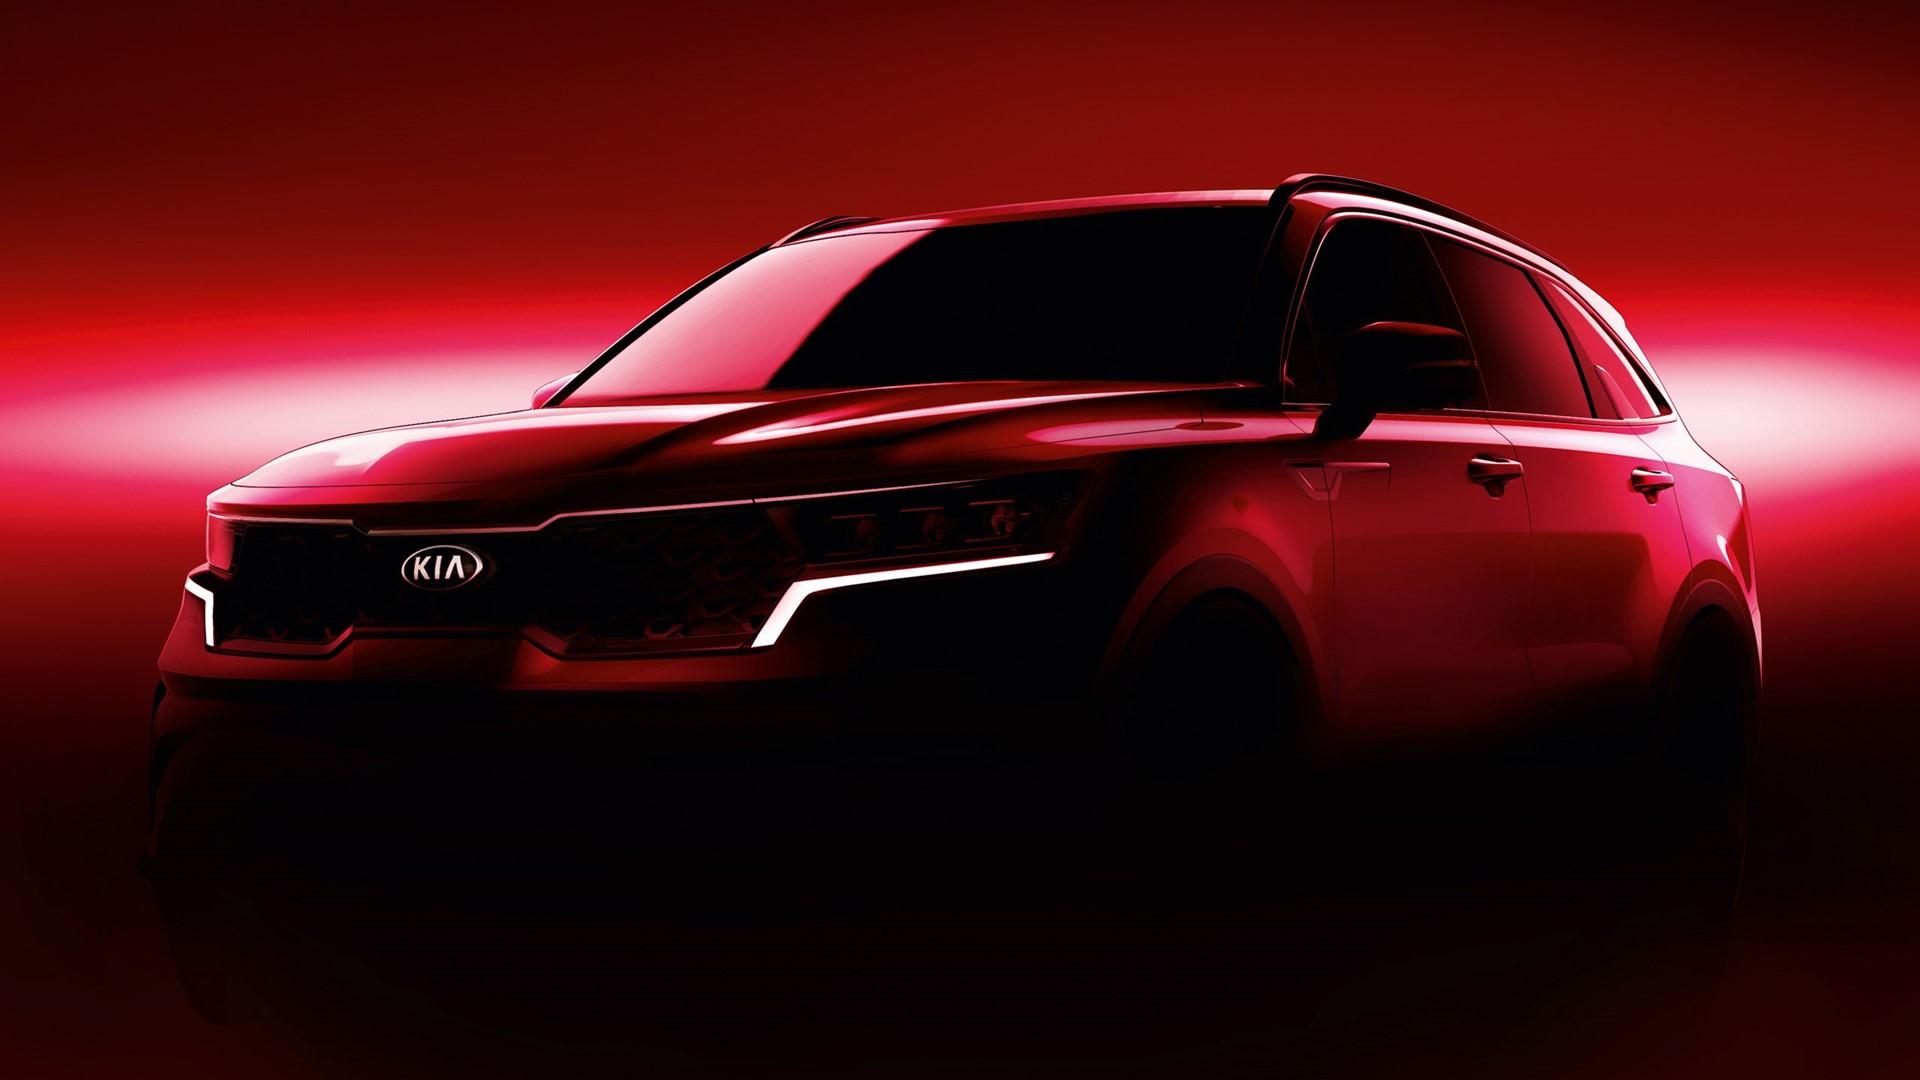 Powerful, progressive and versatile: the new Kia Sorento - Image 8